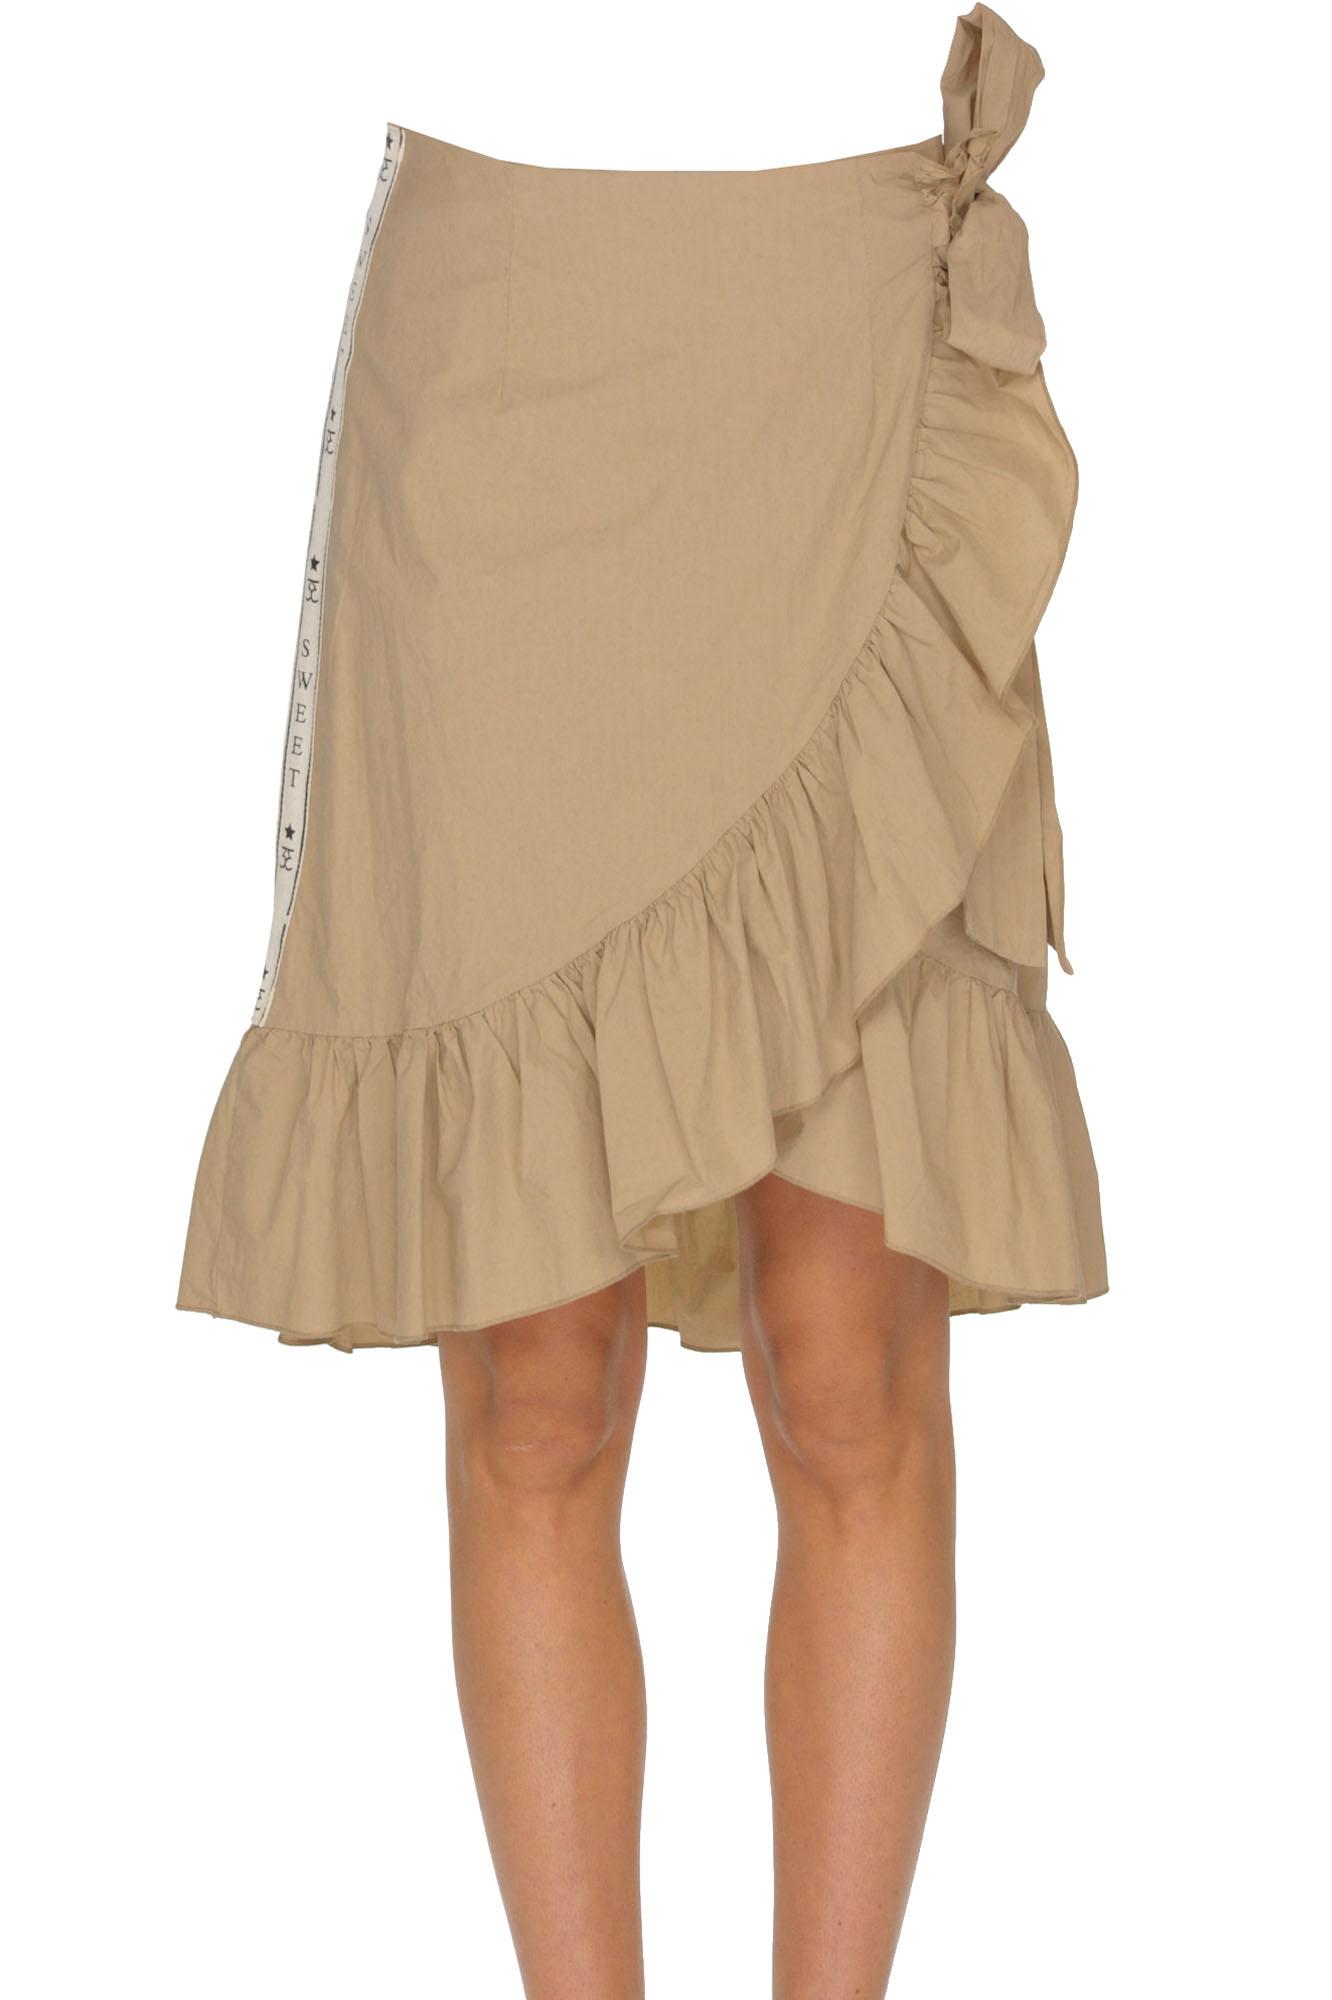 SWEET MATILDA Wraparound Cotton Skirt in Camel